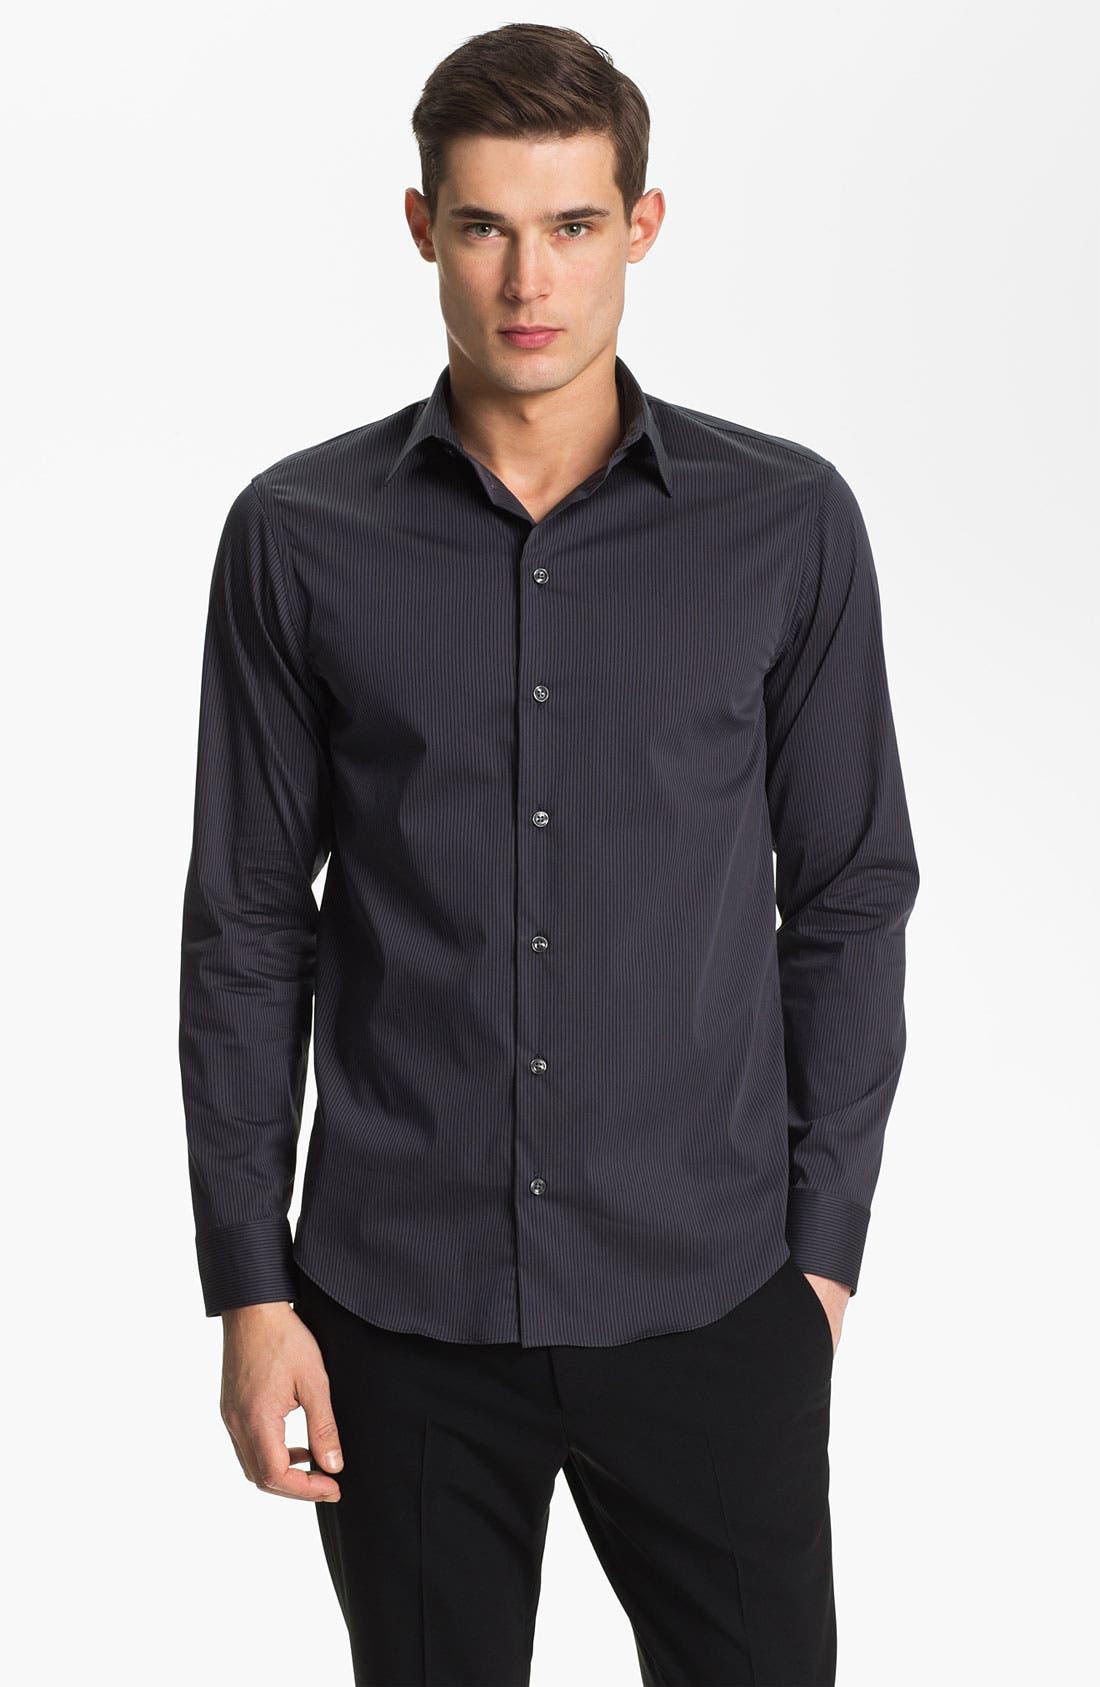 Alternate Image 1 Selected - Armani Collezioni Tonal Stripe Stretch Sport Shirt